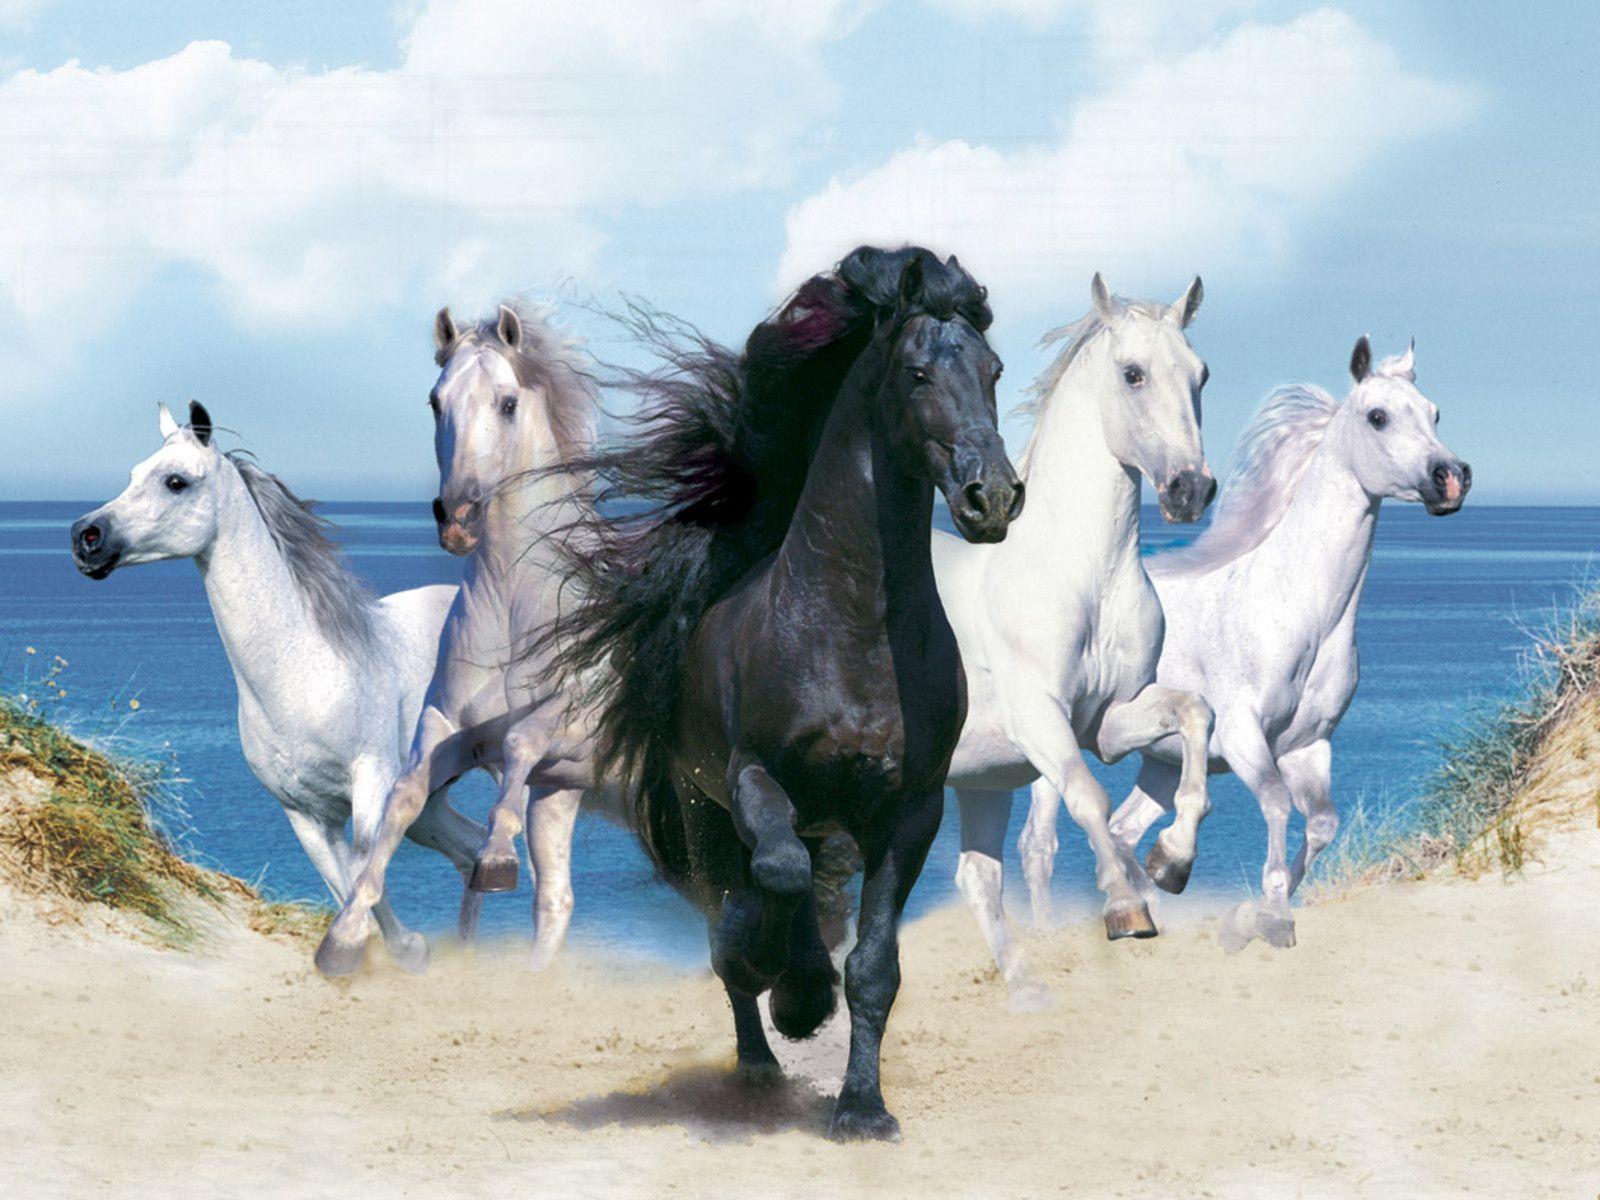 Horse Wallpaper Desktop